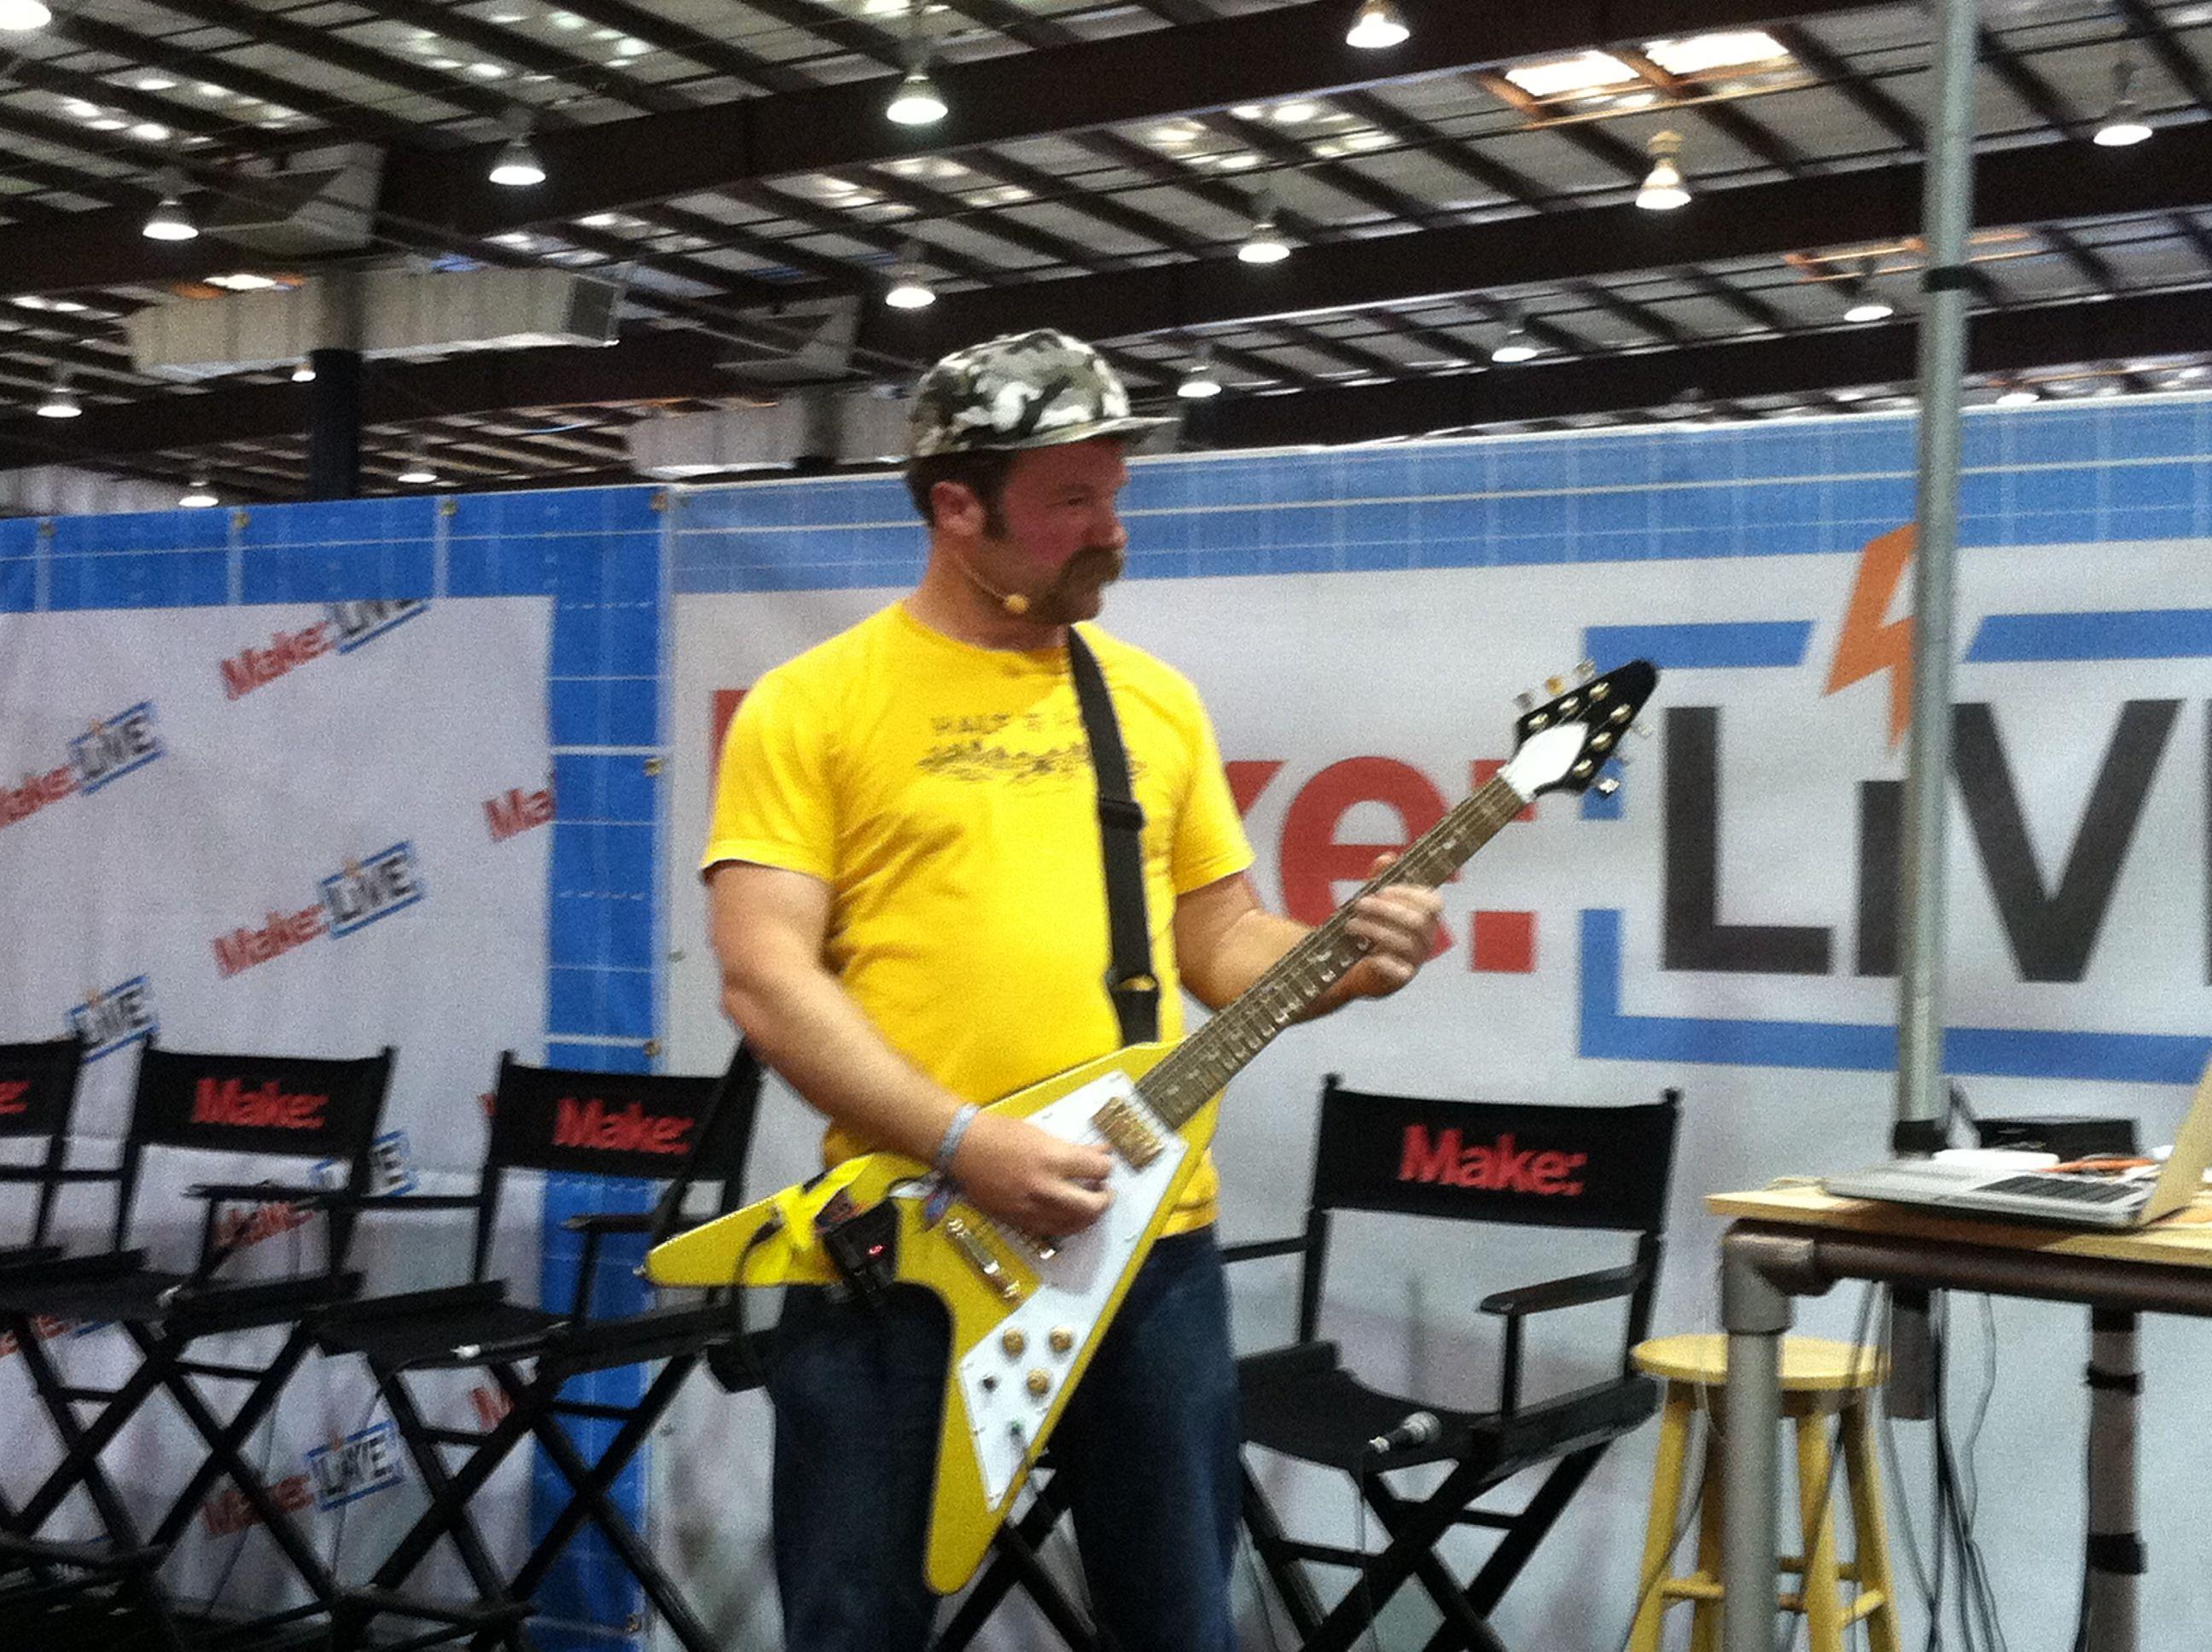 David Neevel Riffs on Maker Faire